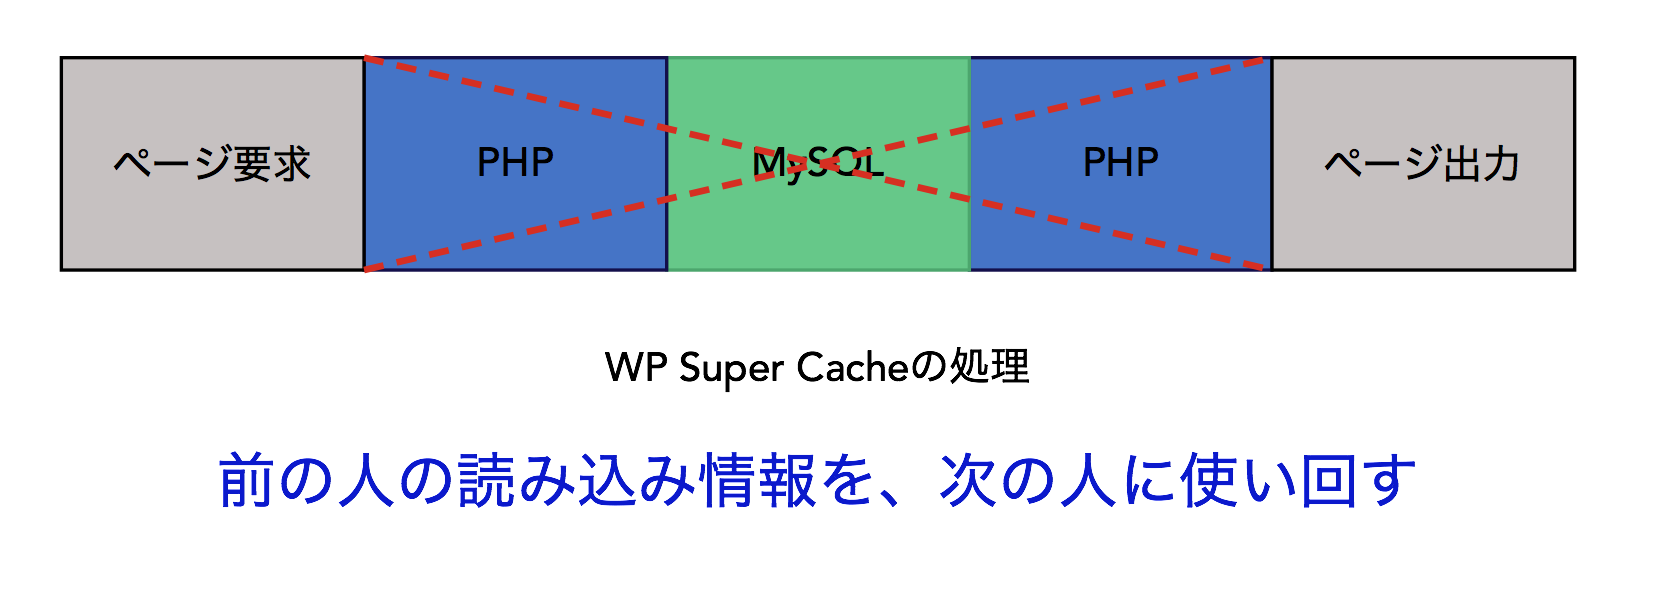 WP Super Cacheの処理